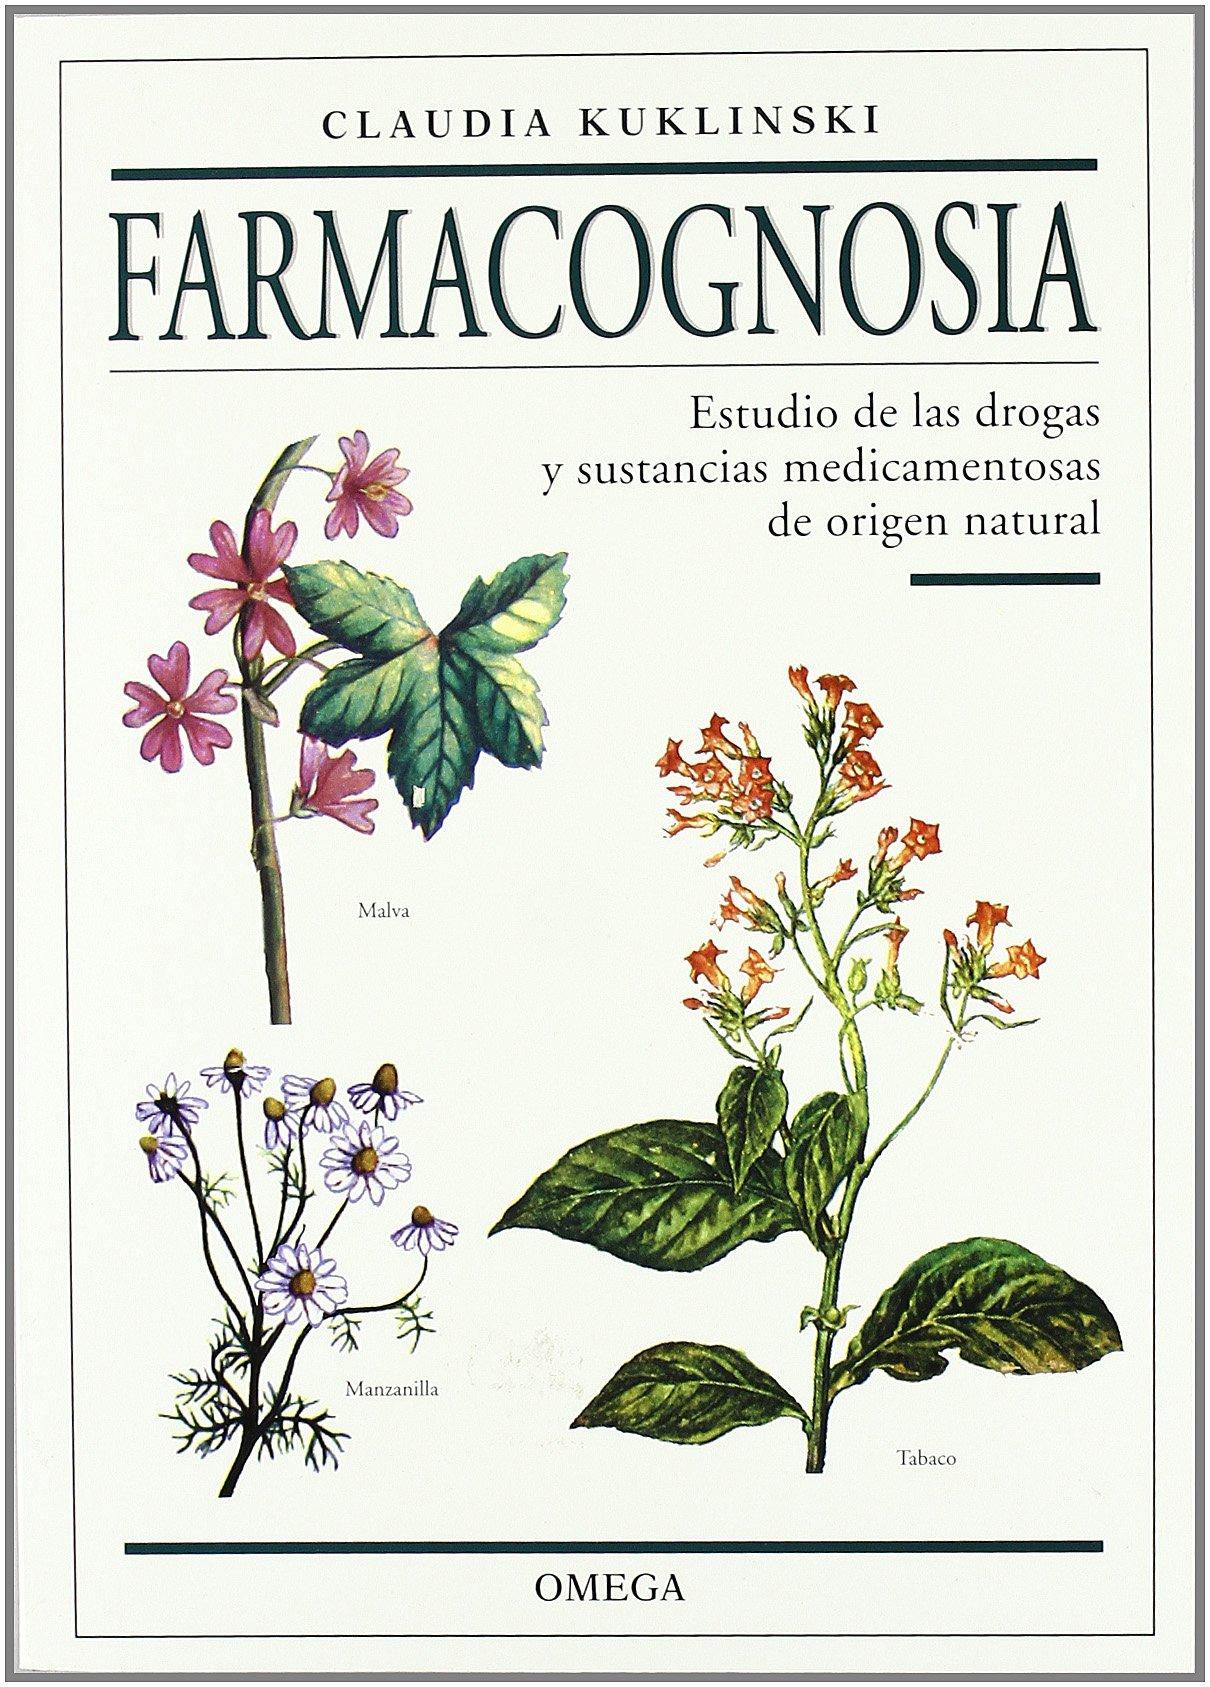 Farmacognosia (Spanish Edition) ebook